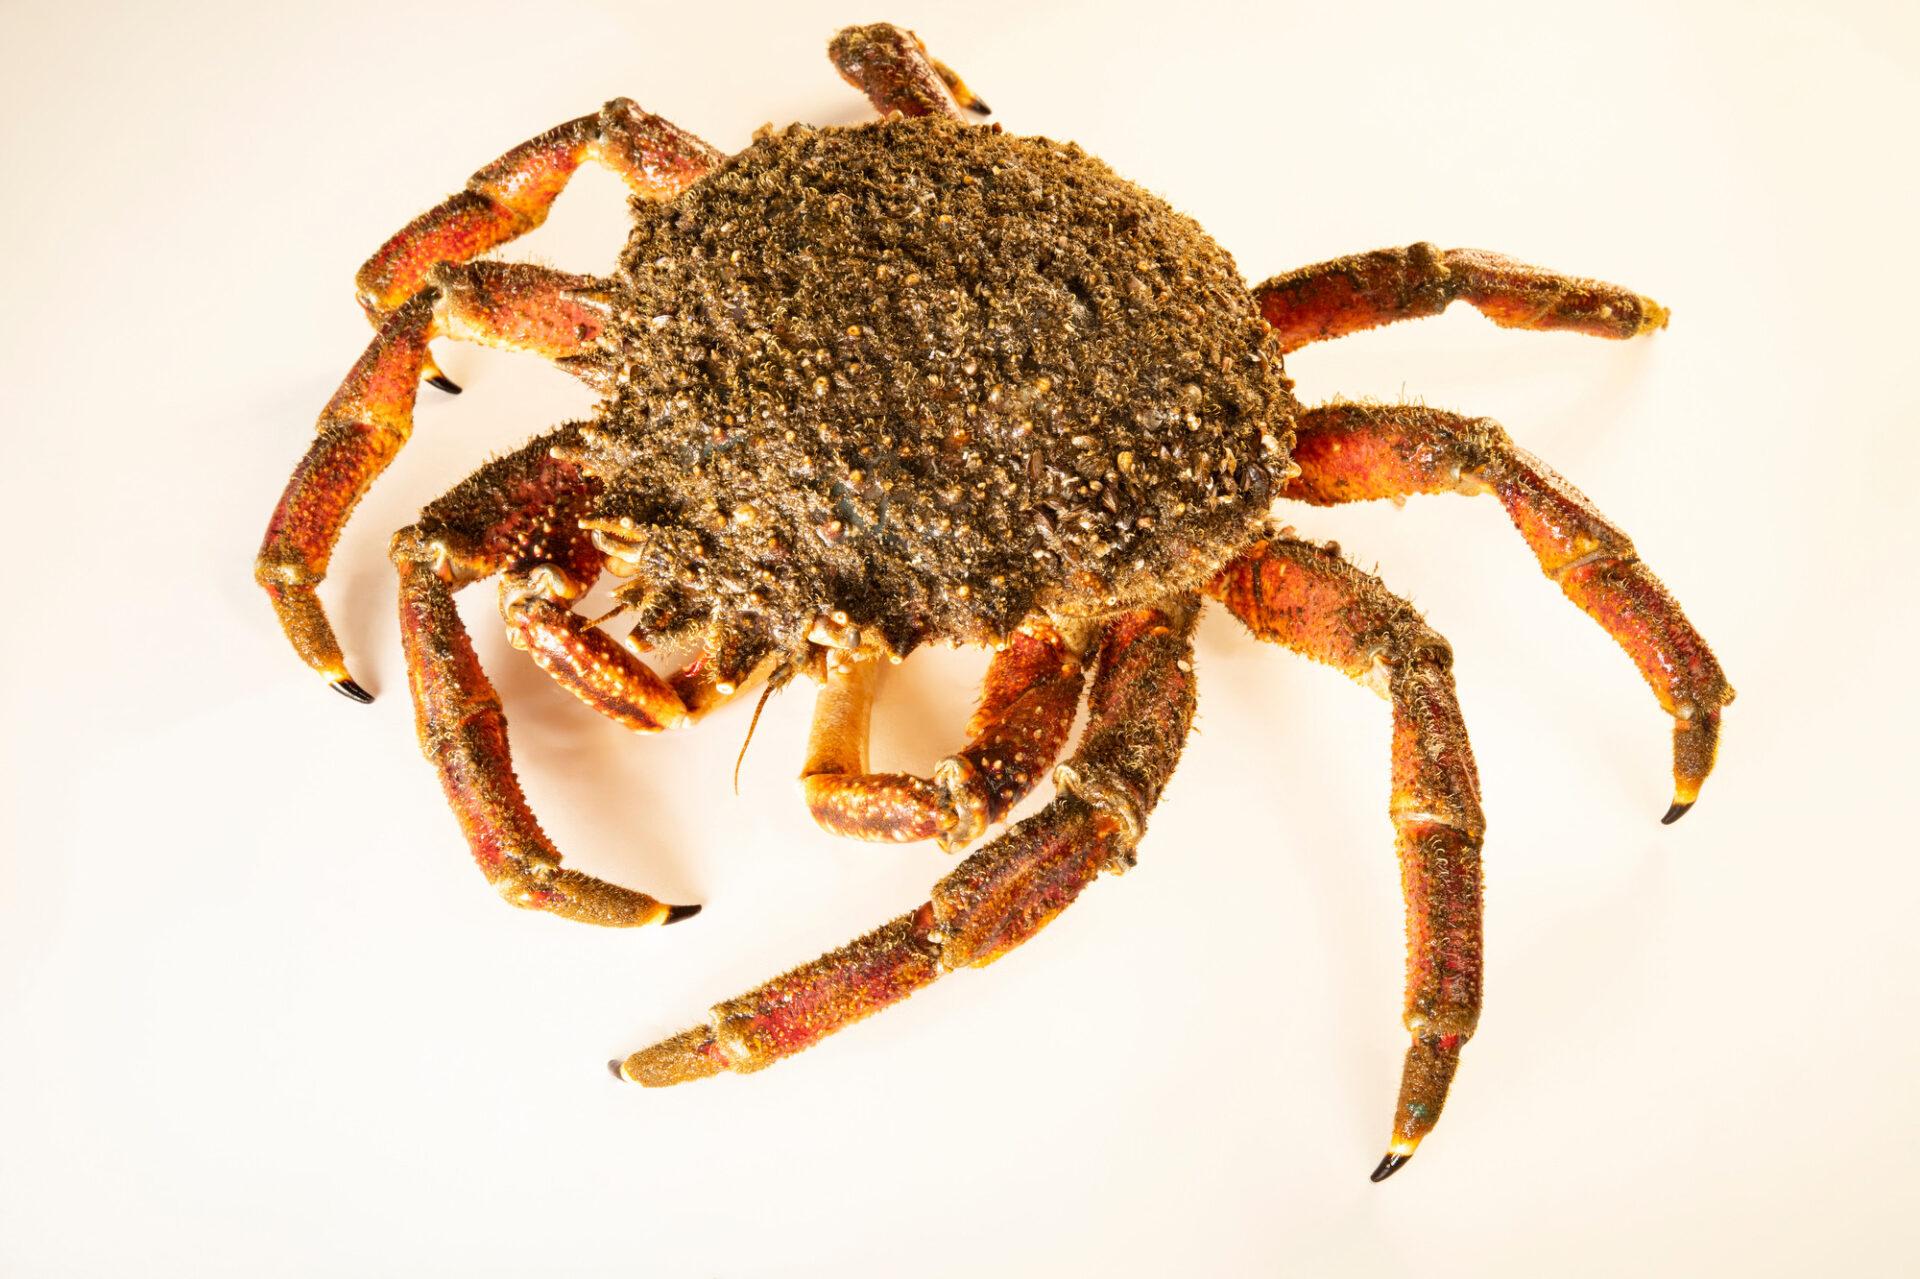 Photo: A sea spider (Maja brachydactyla) at the Littoral Station of Aguda, Portugal.